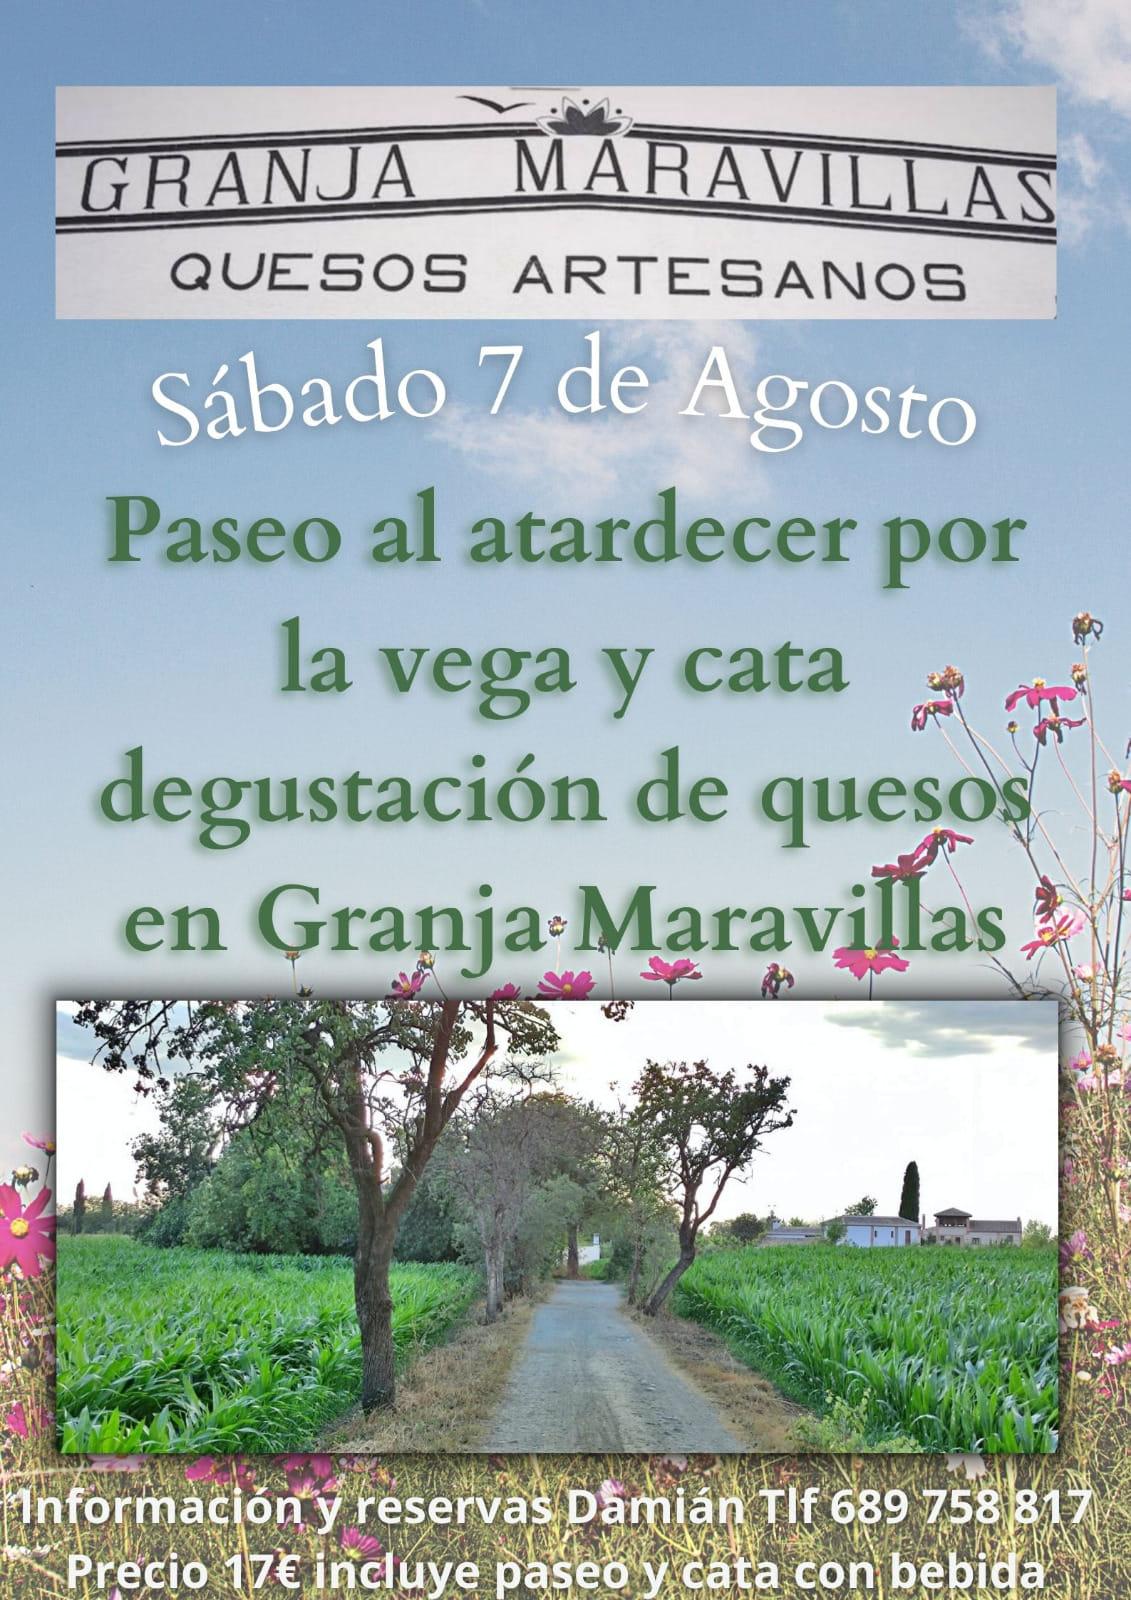 Damian Paseos Granadinos visita Granja Maravillas